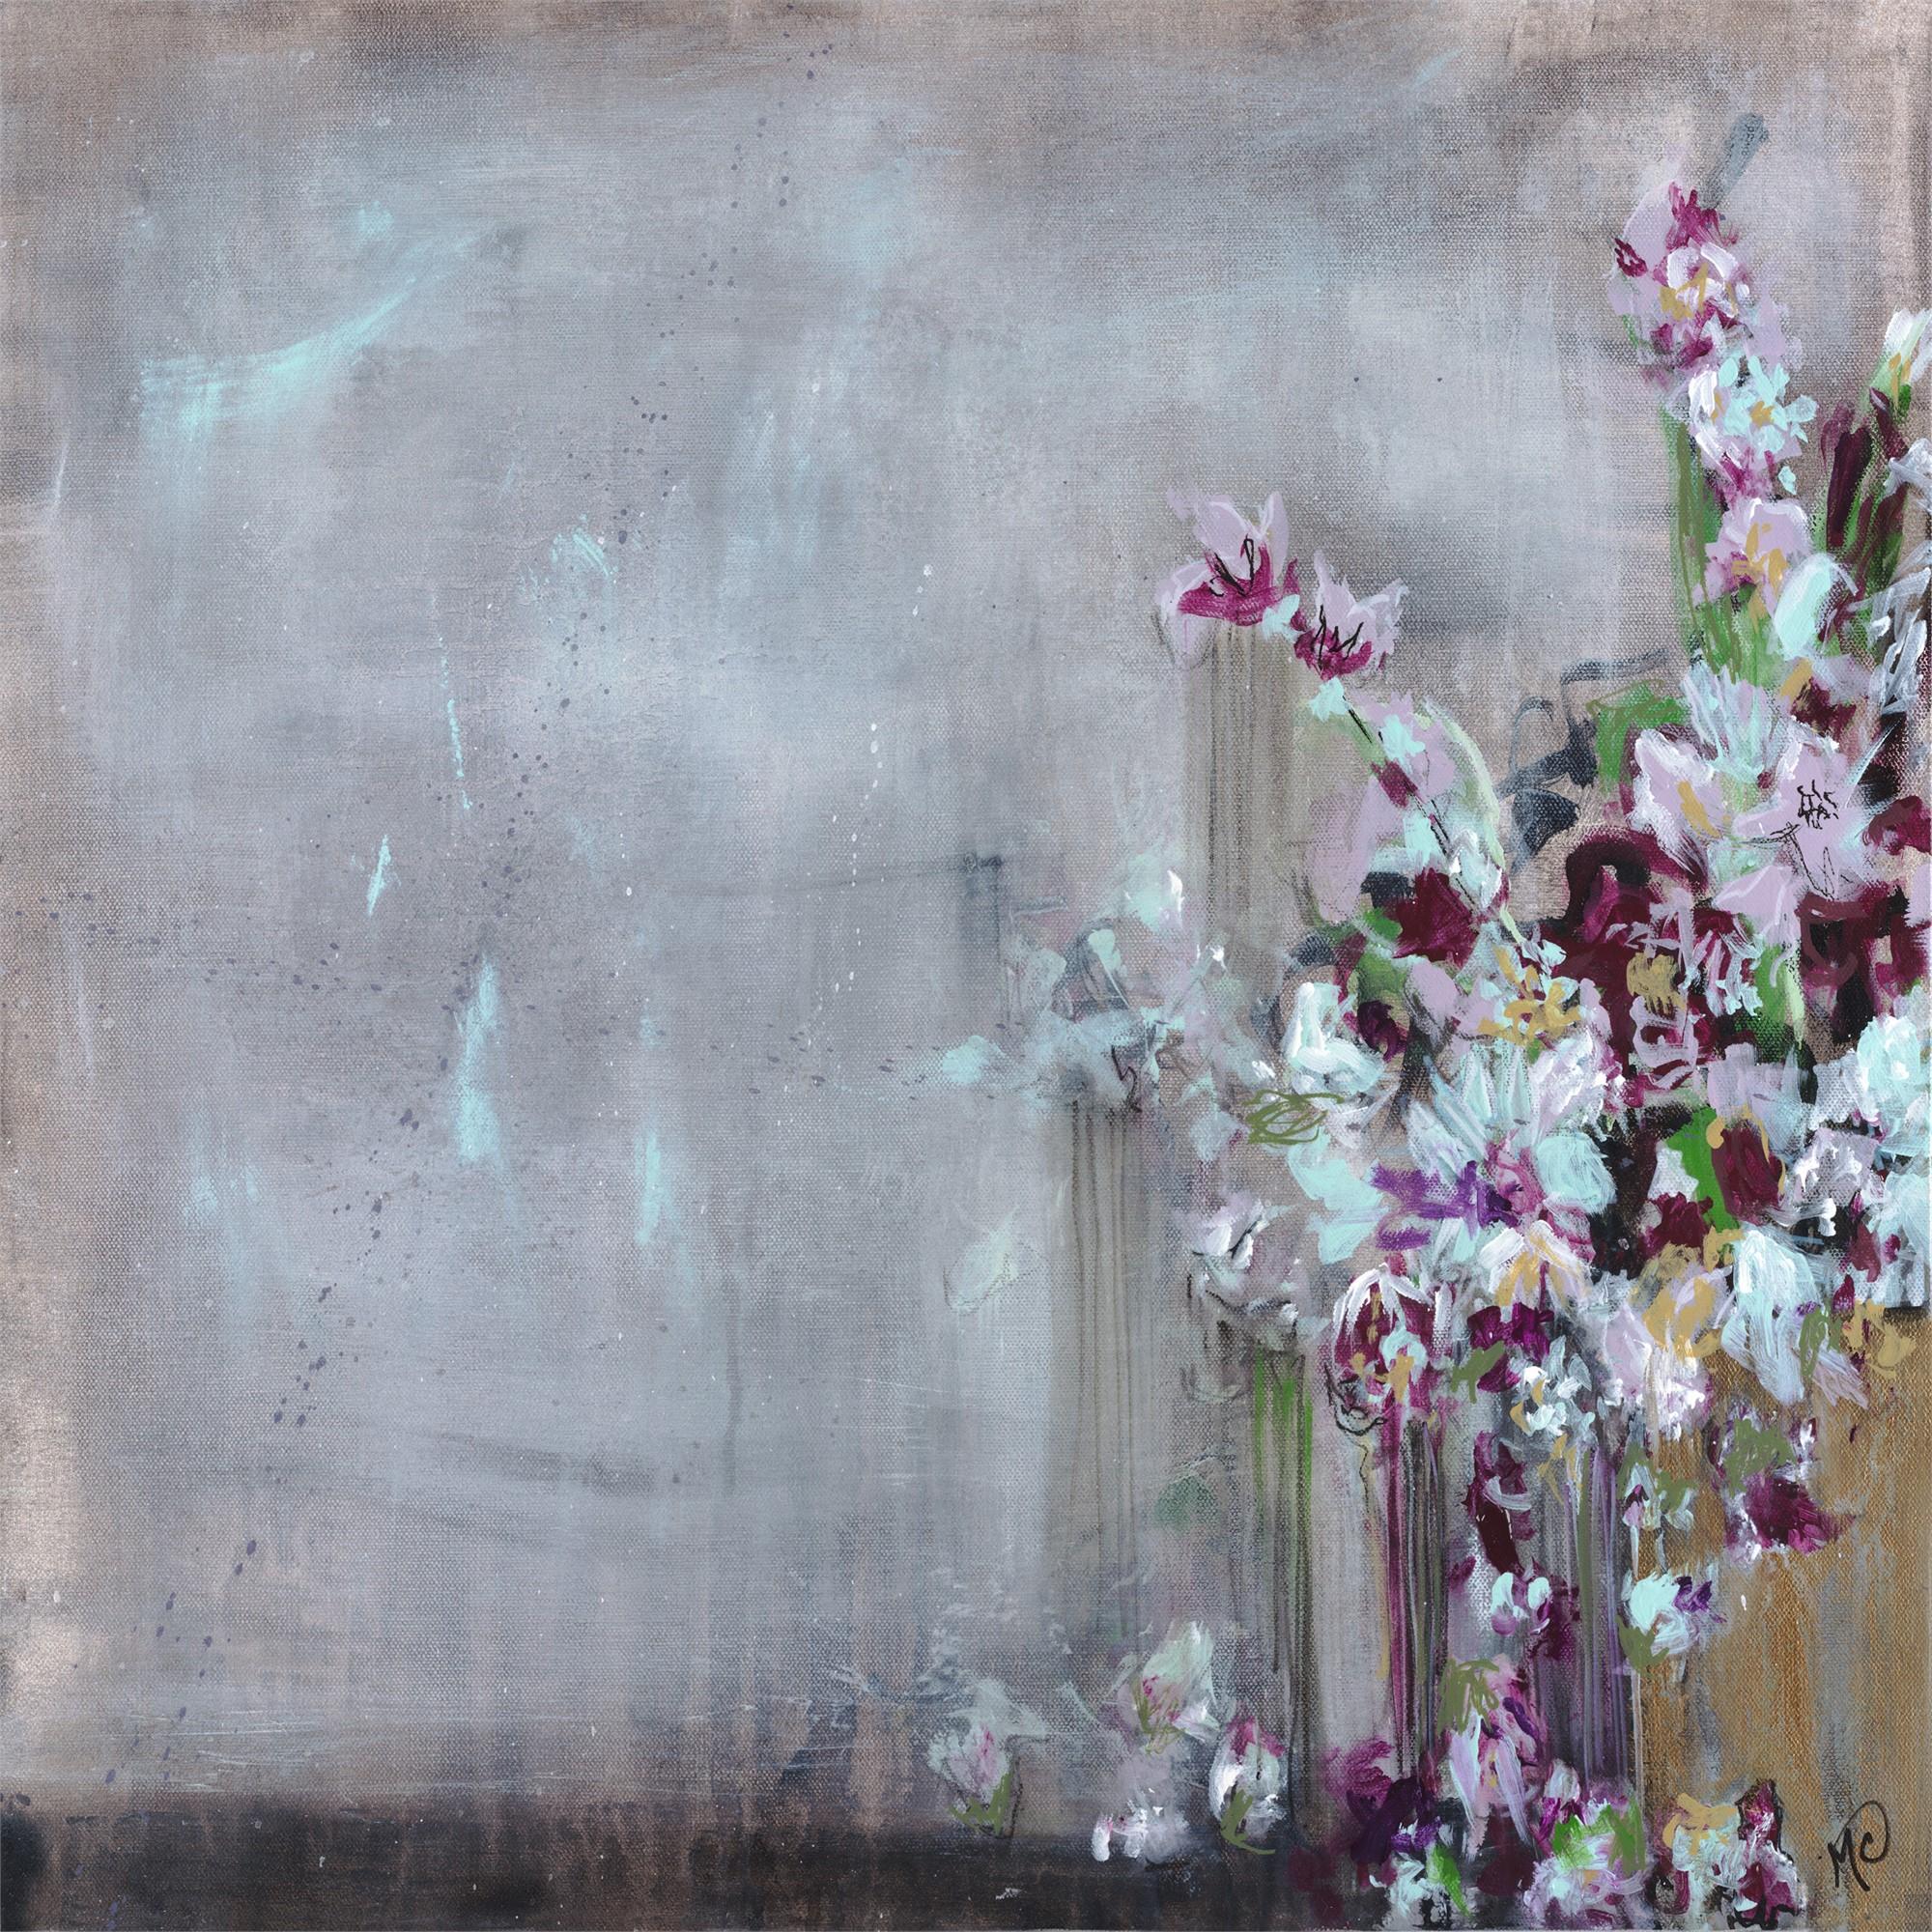 Enigma by Marcie Coltman